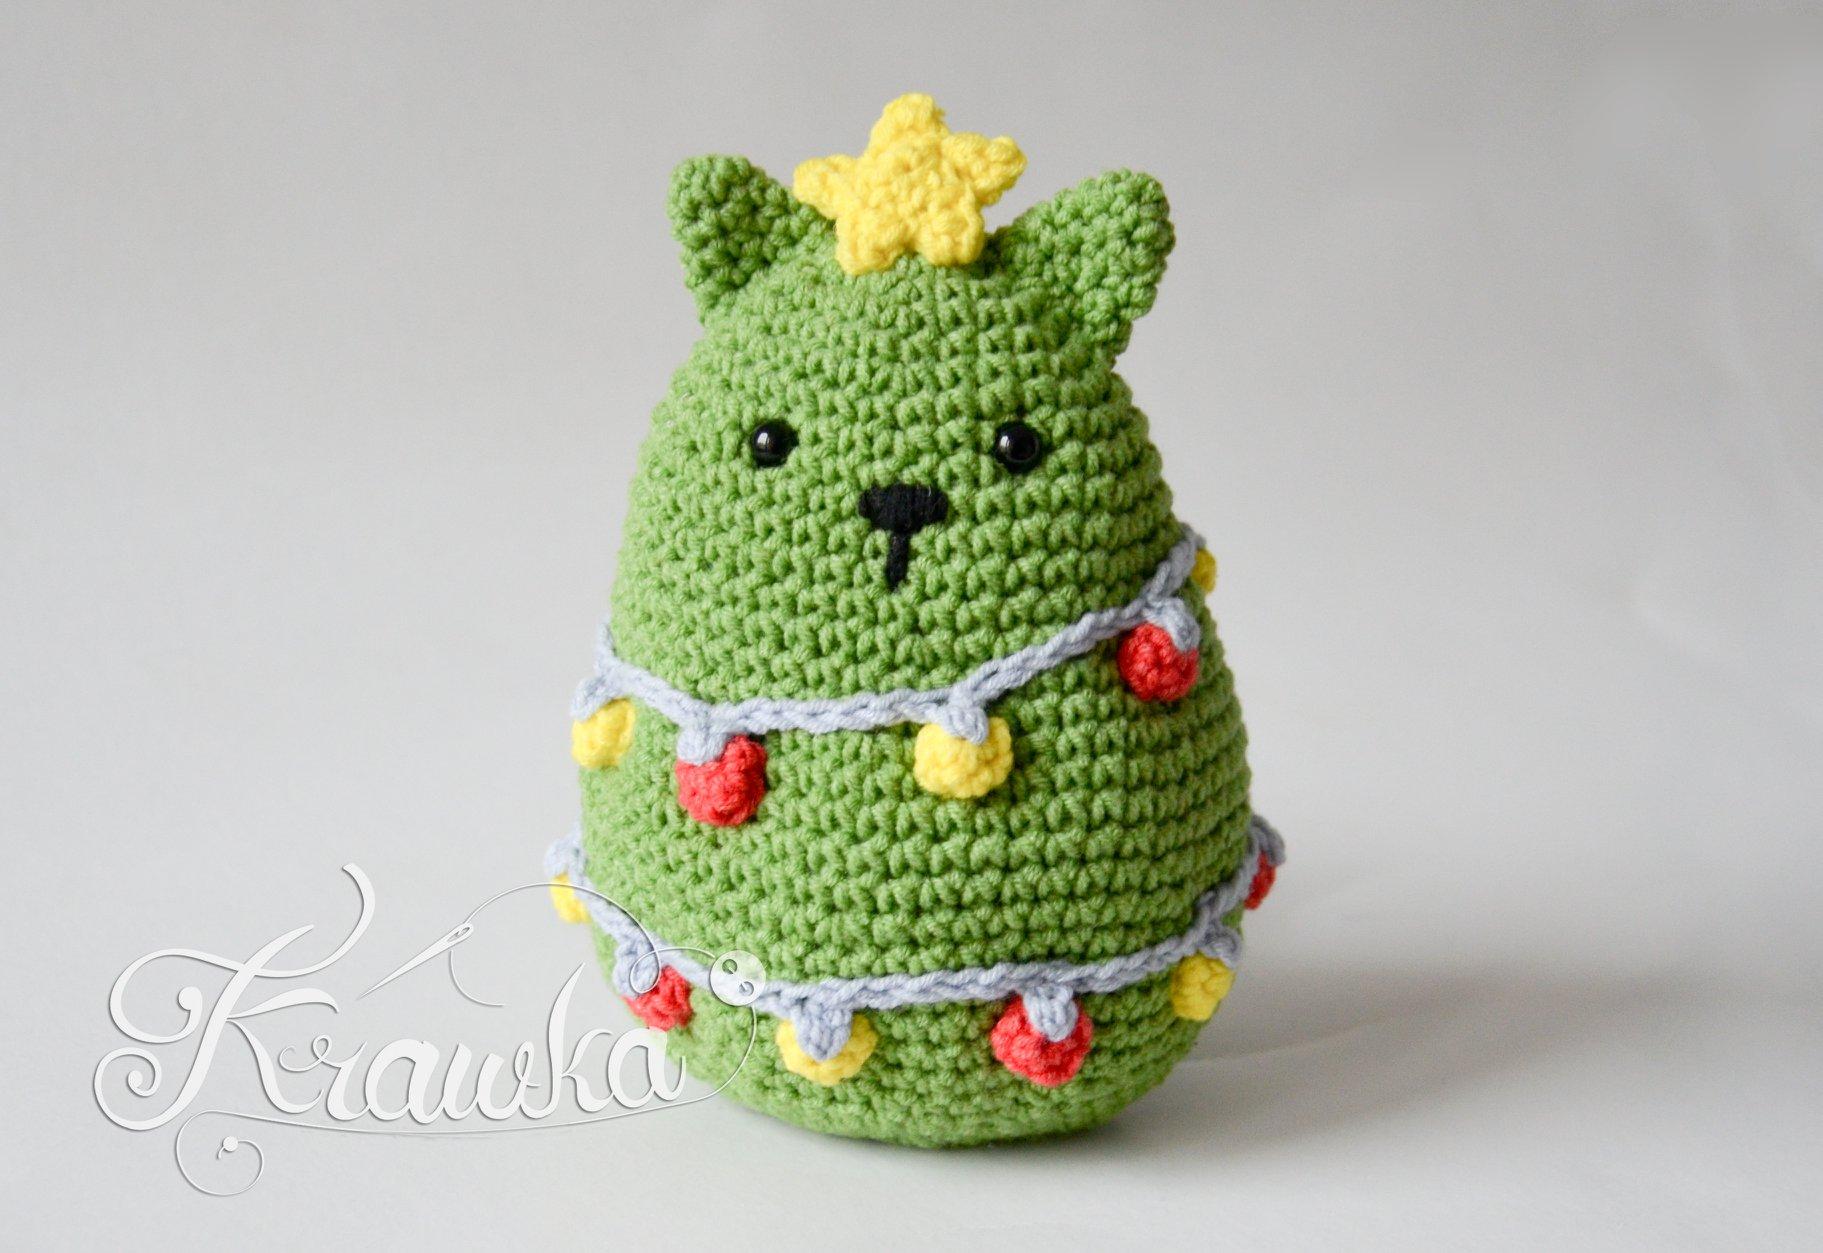 Crochet a Christmas Cat Tree, Pattern By Krawka